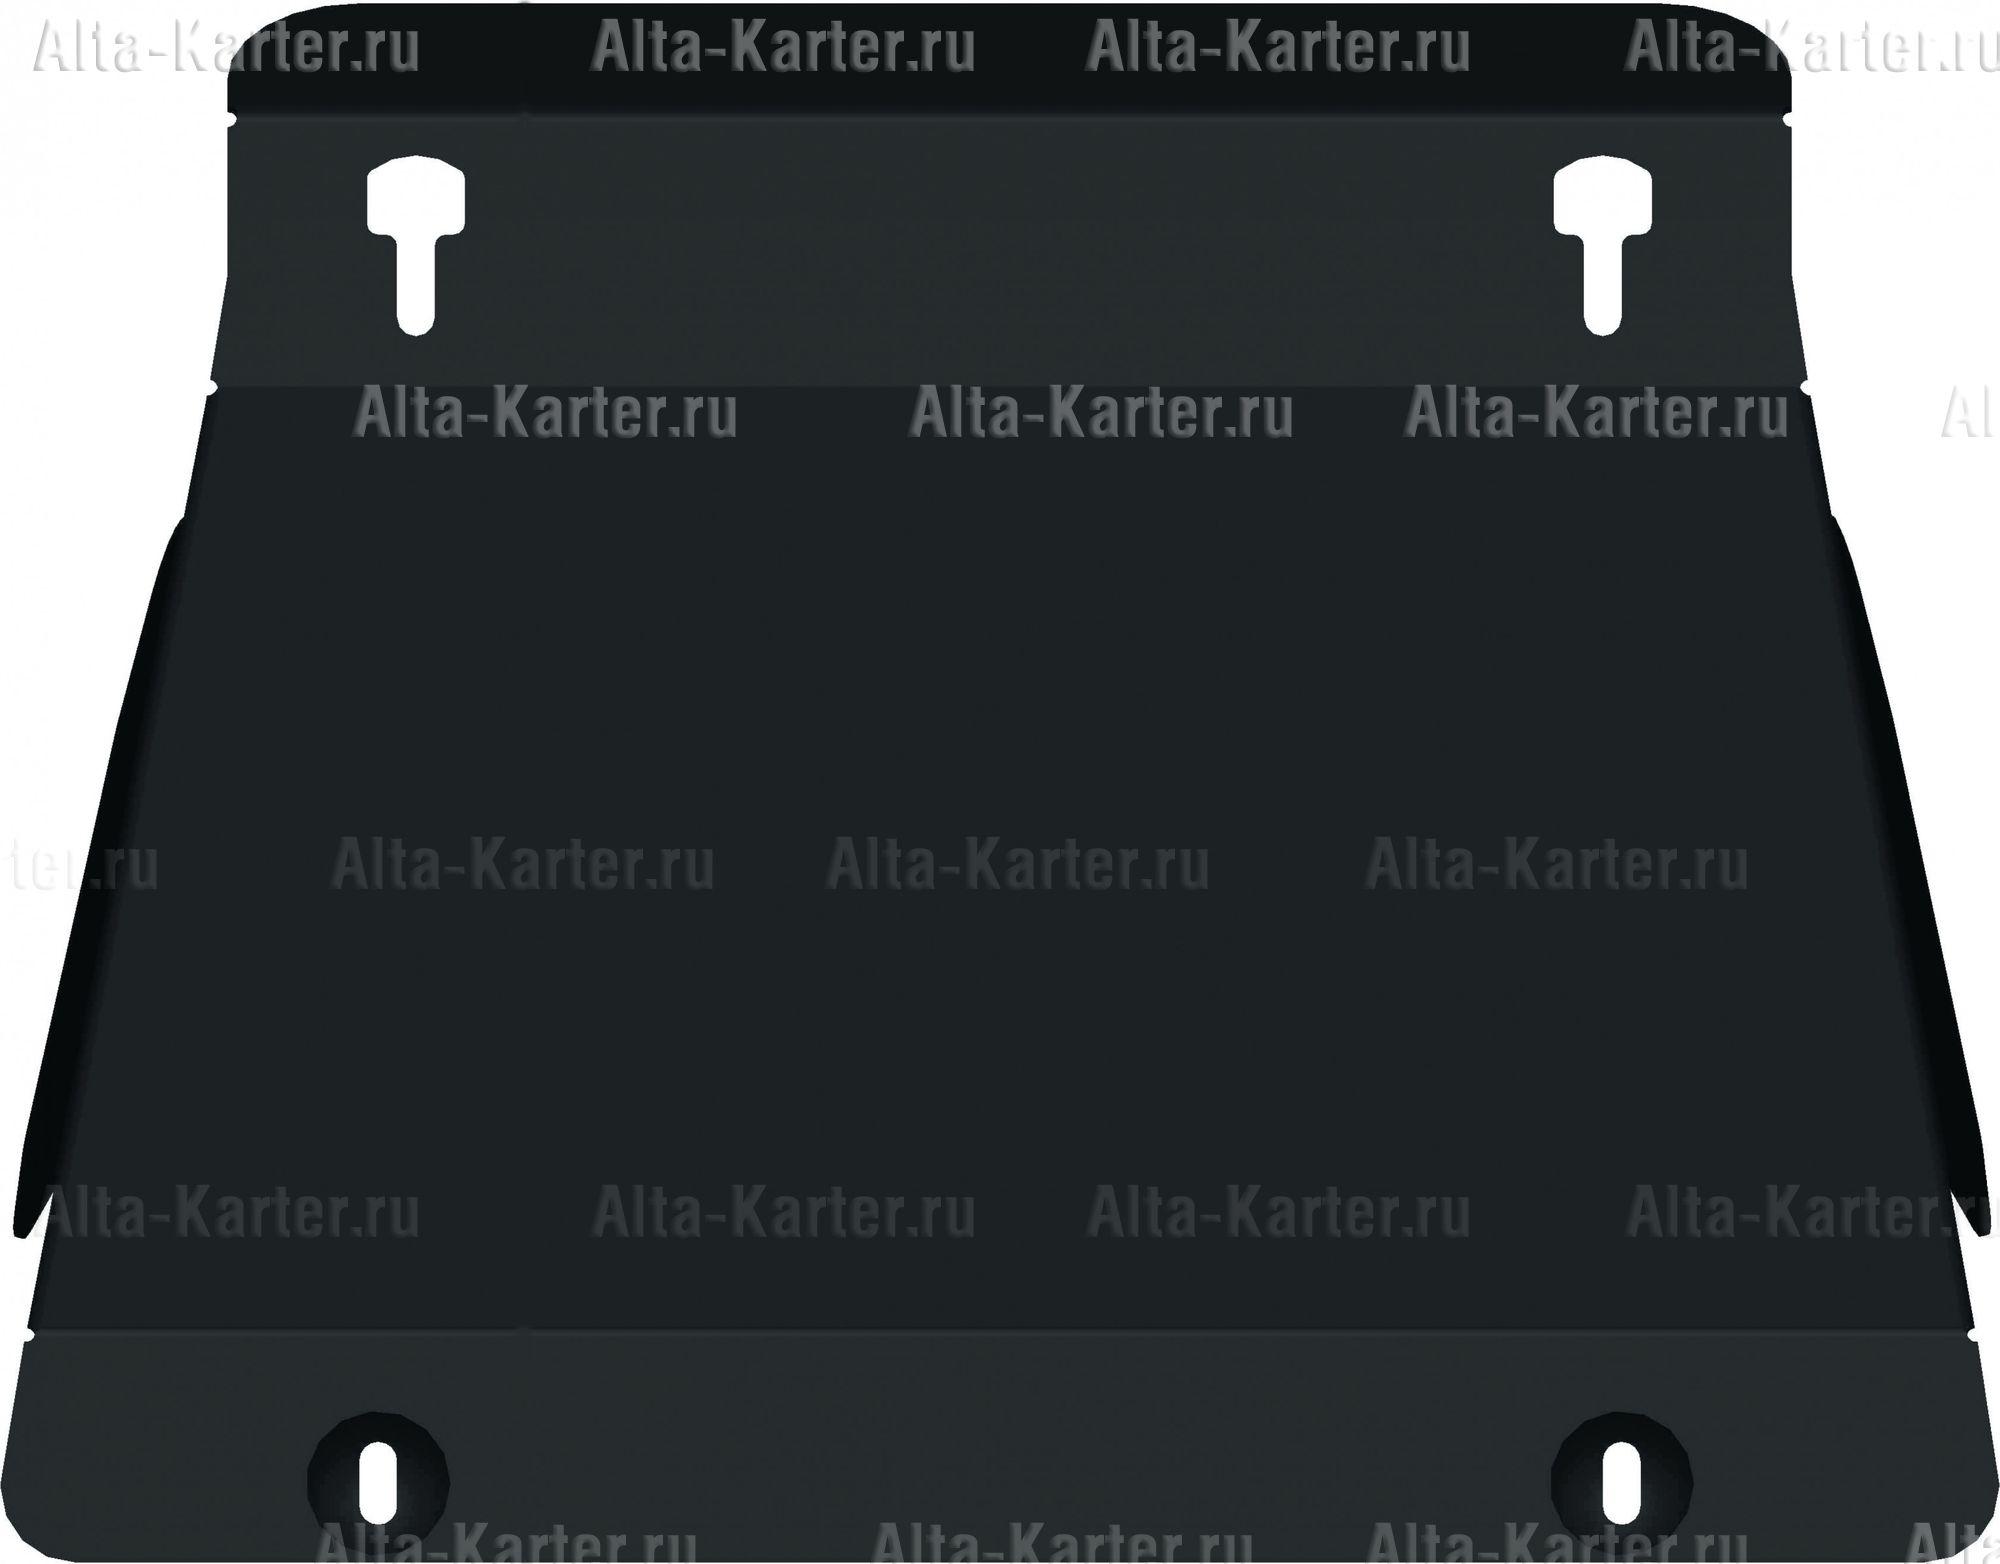 Защита Alfeco для картера Mitsubish Pajero Mini 1998-2012. Артикул ALF.14.40